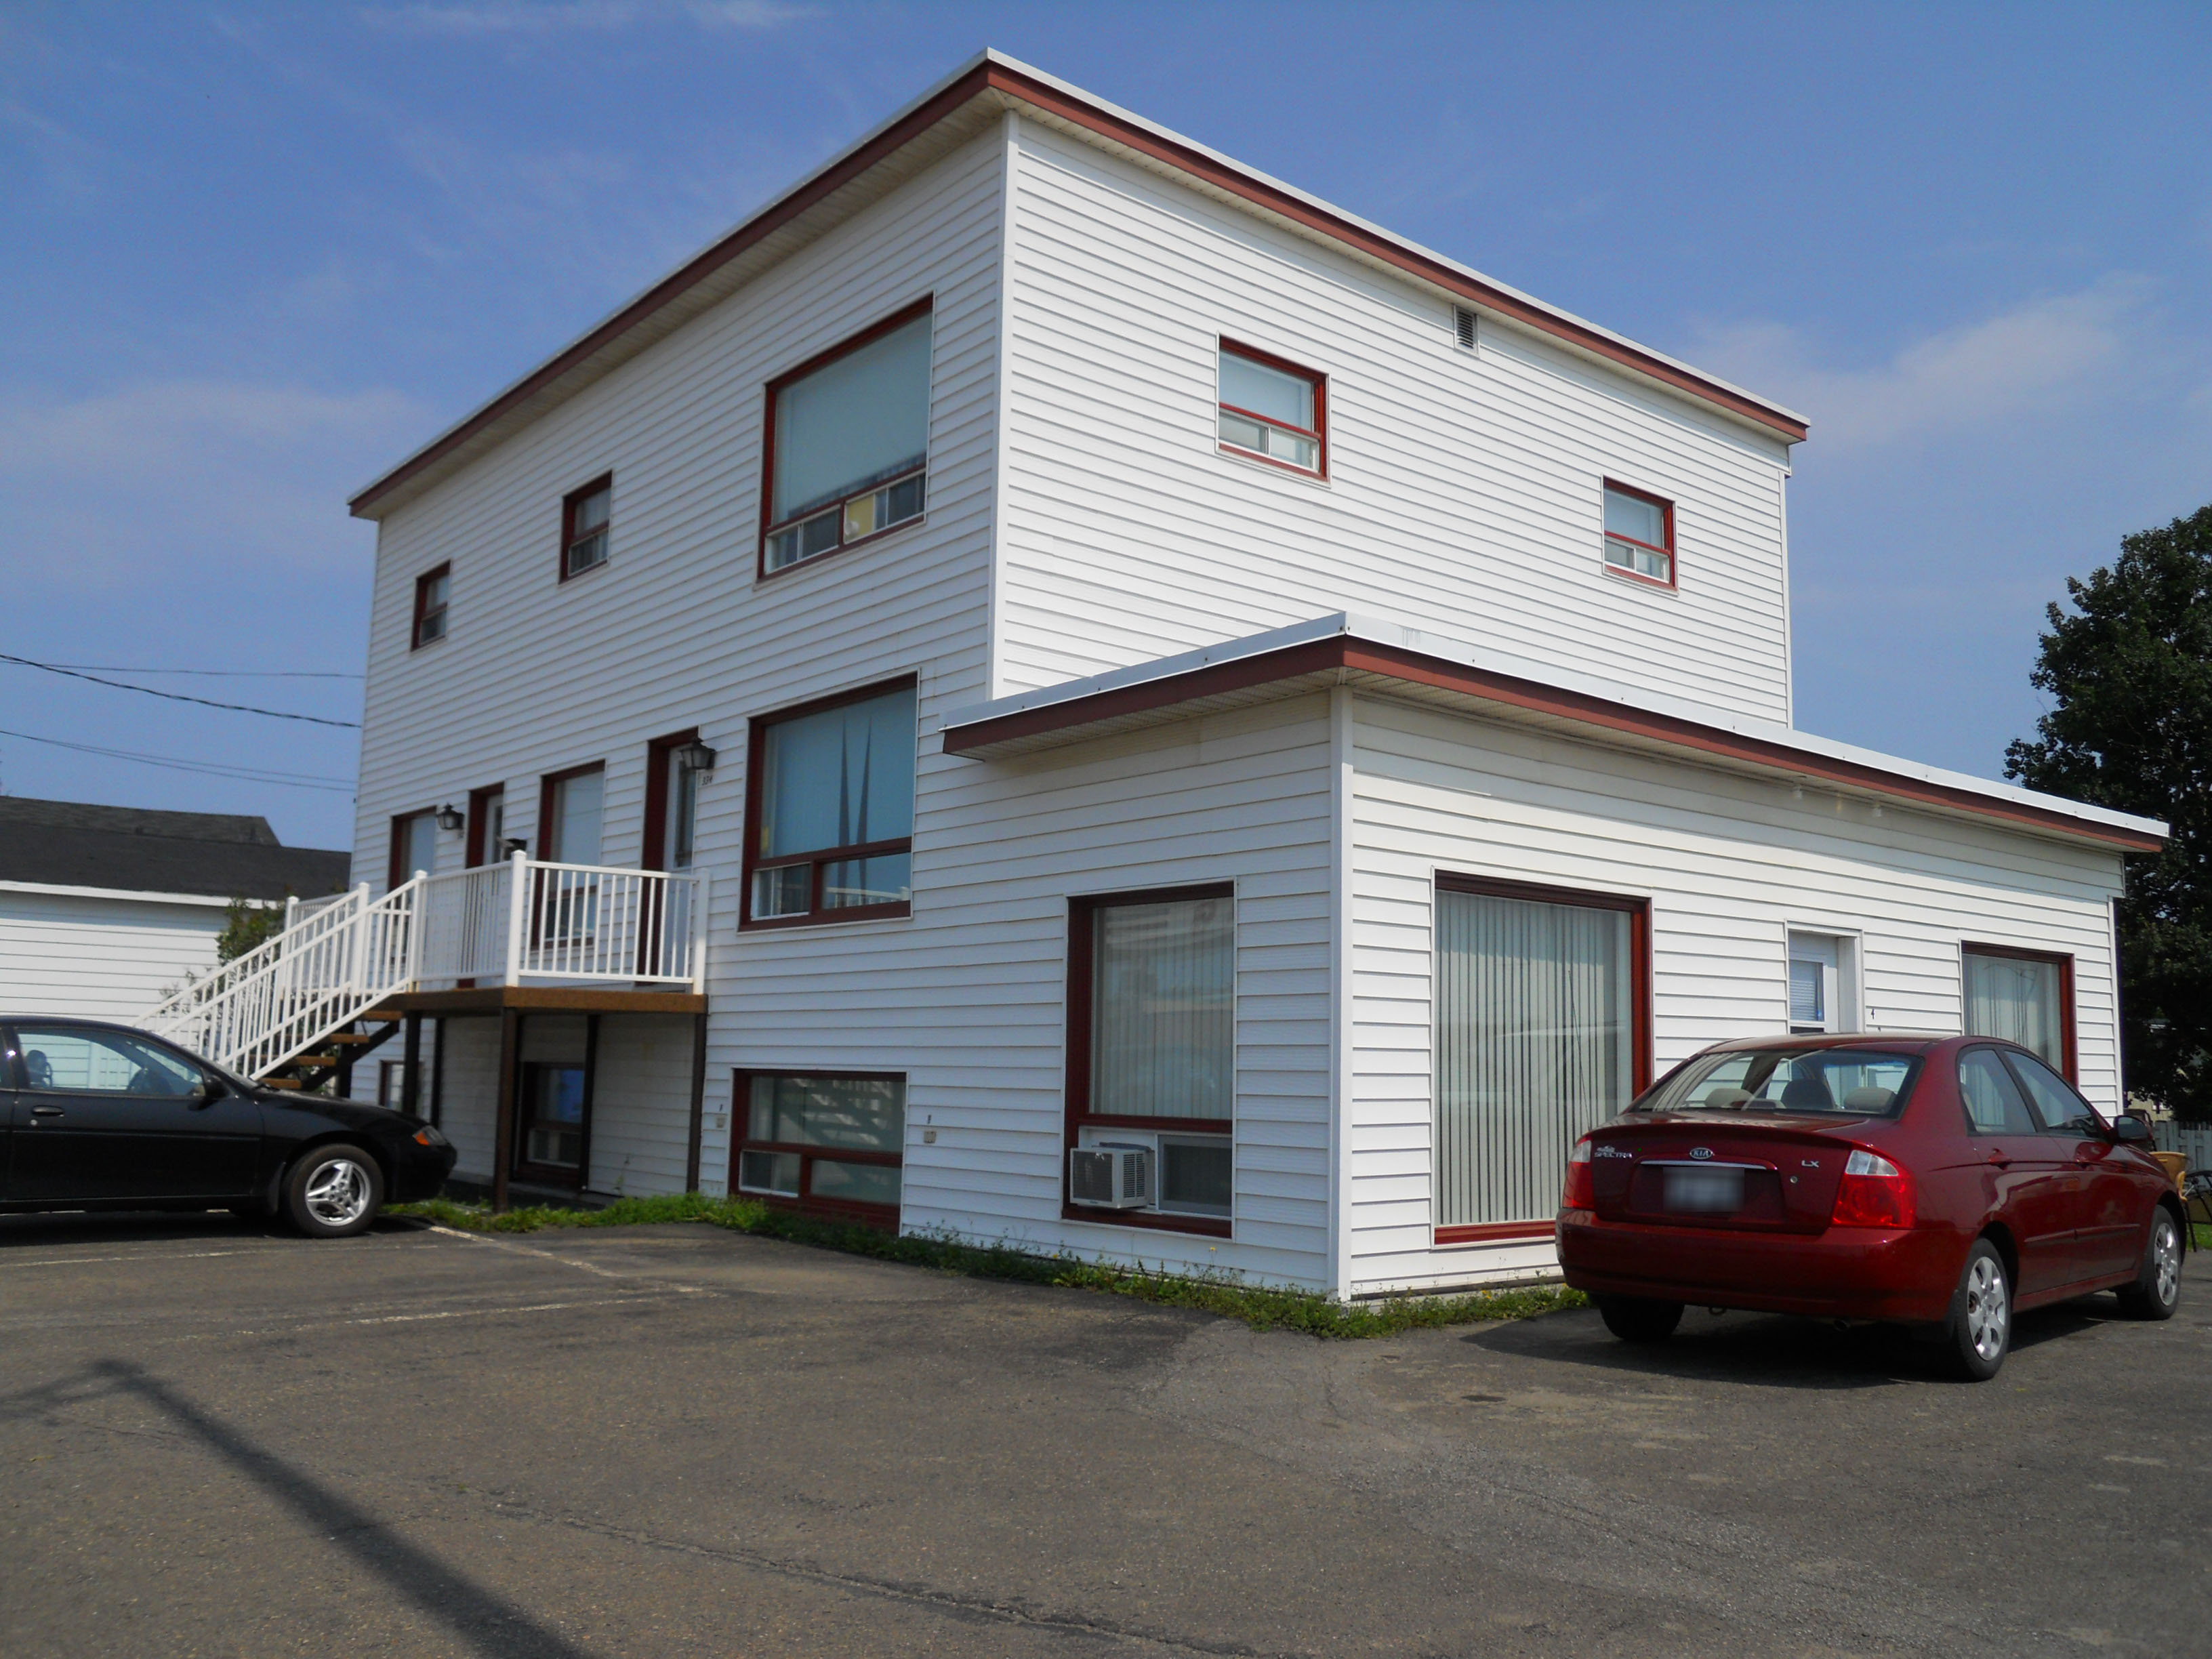 2014 - 332-334, rue Dollard Nord